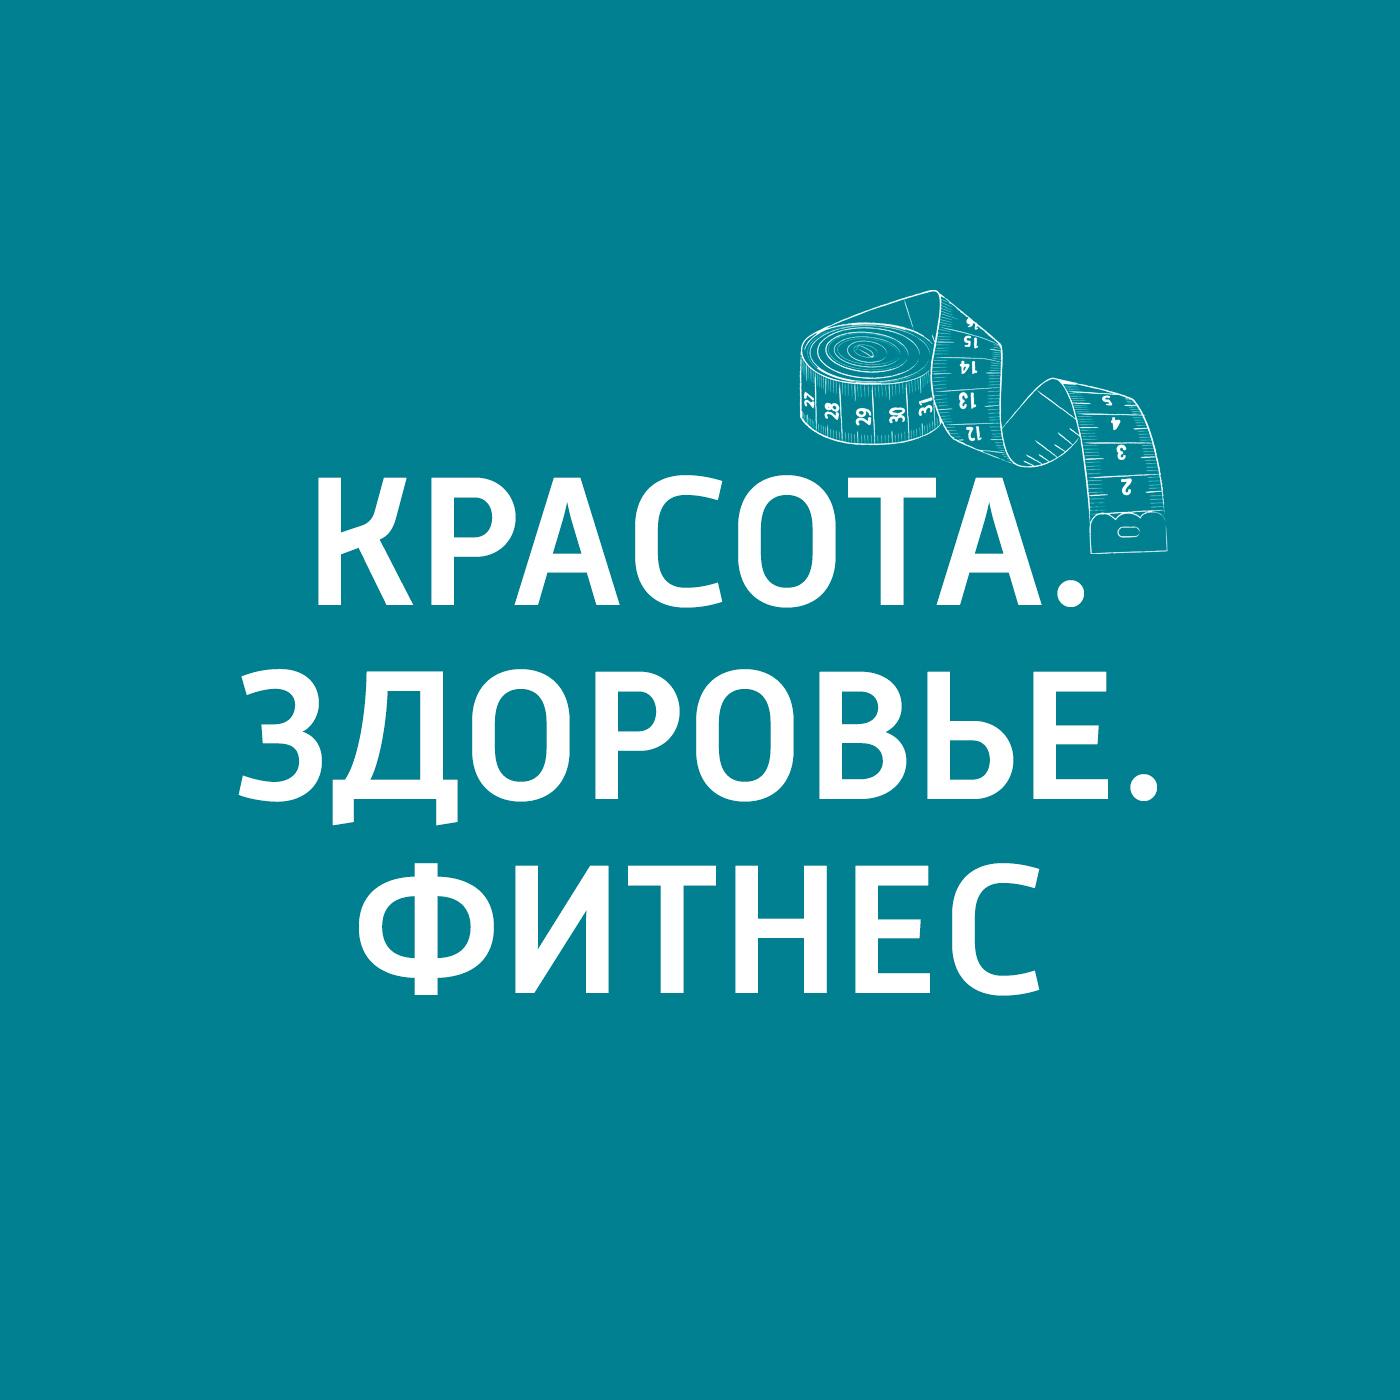 Маргарита Митрофанова Роды маргарита митрофанова игорь григорьев